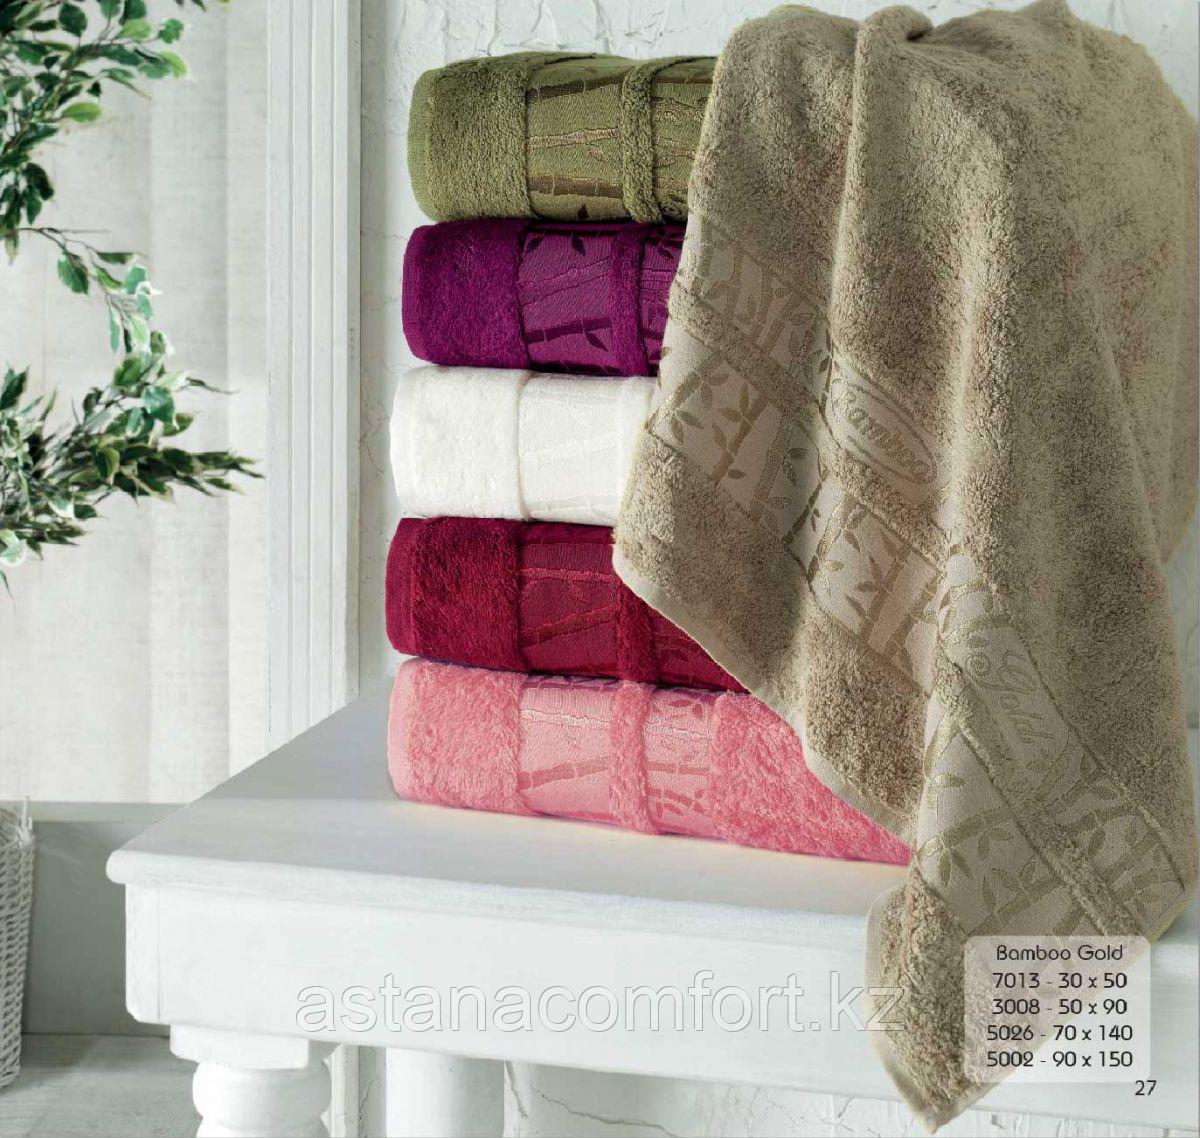 Полотенце для лица. 50*90 см. Бамбук. Турция.